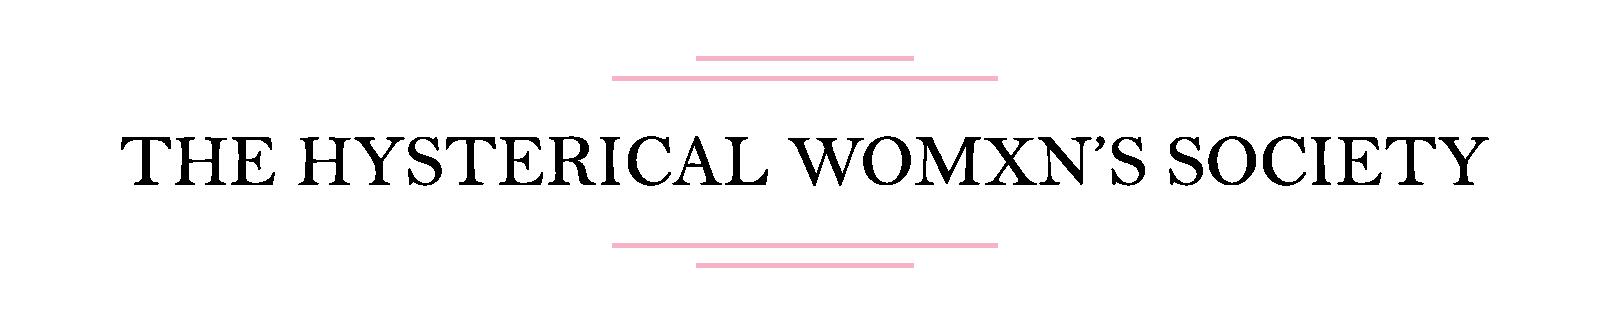 HWS Logo_Transparent_Horizontal.png